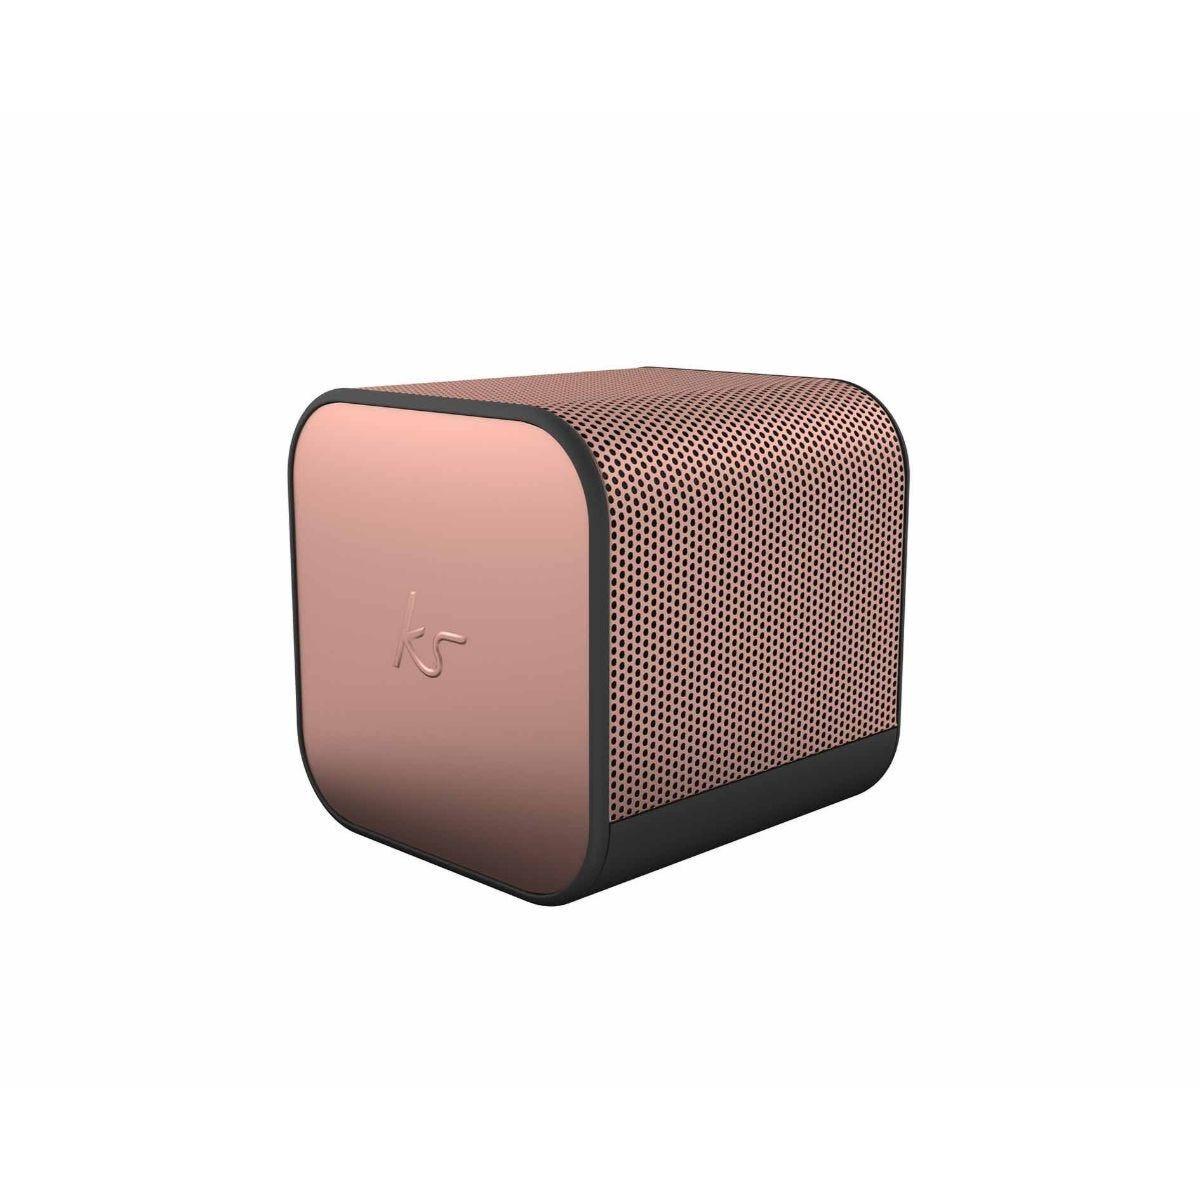 KitSound BoomCube Portable Bluetooth Speaker Rose Gold